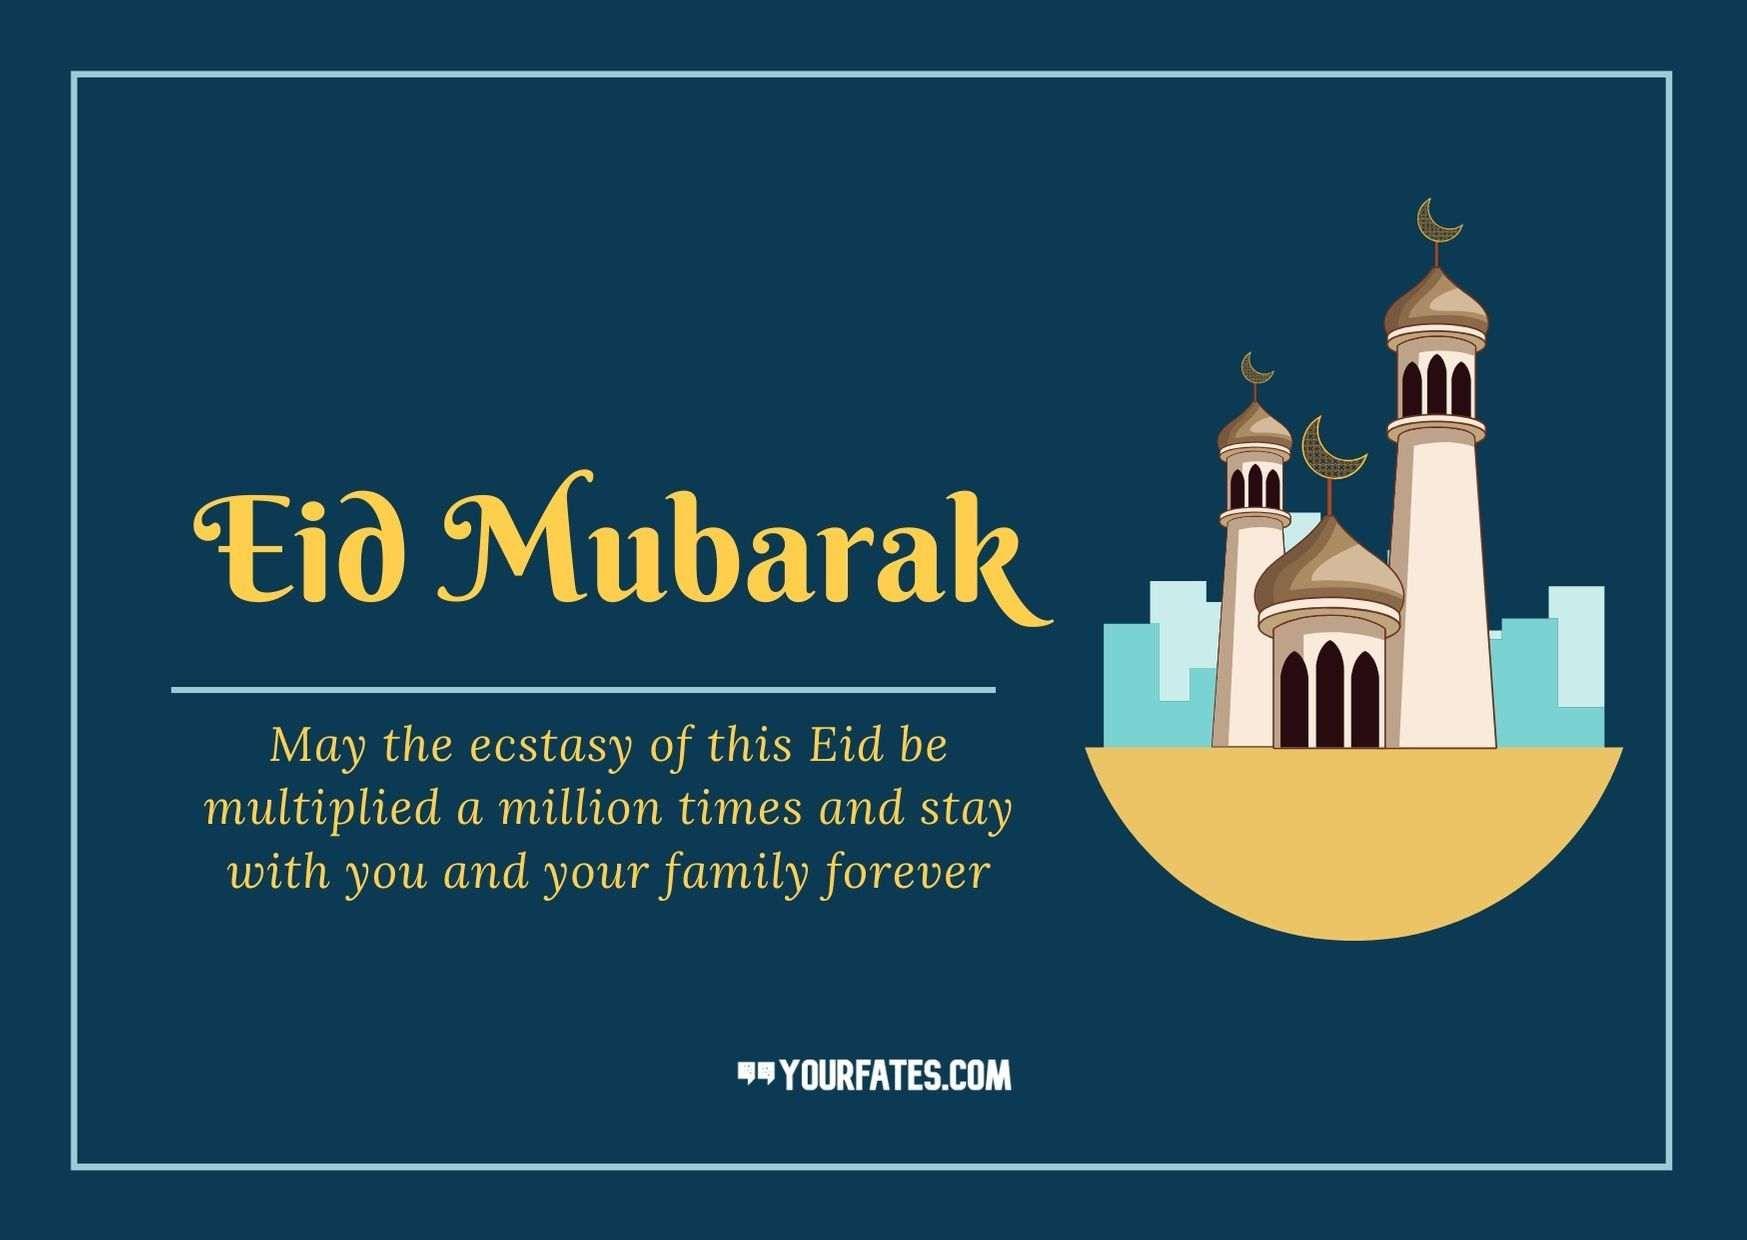 Pin by Funmilayo Odetoyan on My Saves | Happy eid ul fitr, Eid mubarak,  Happy eid mubarak wishes